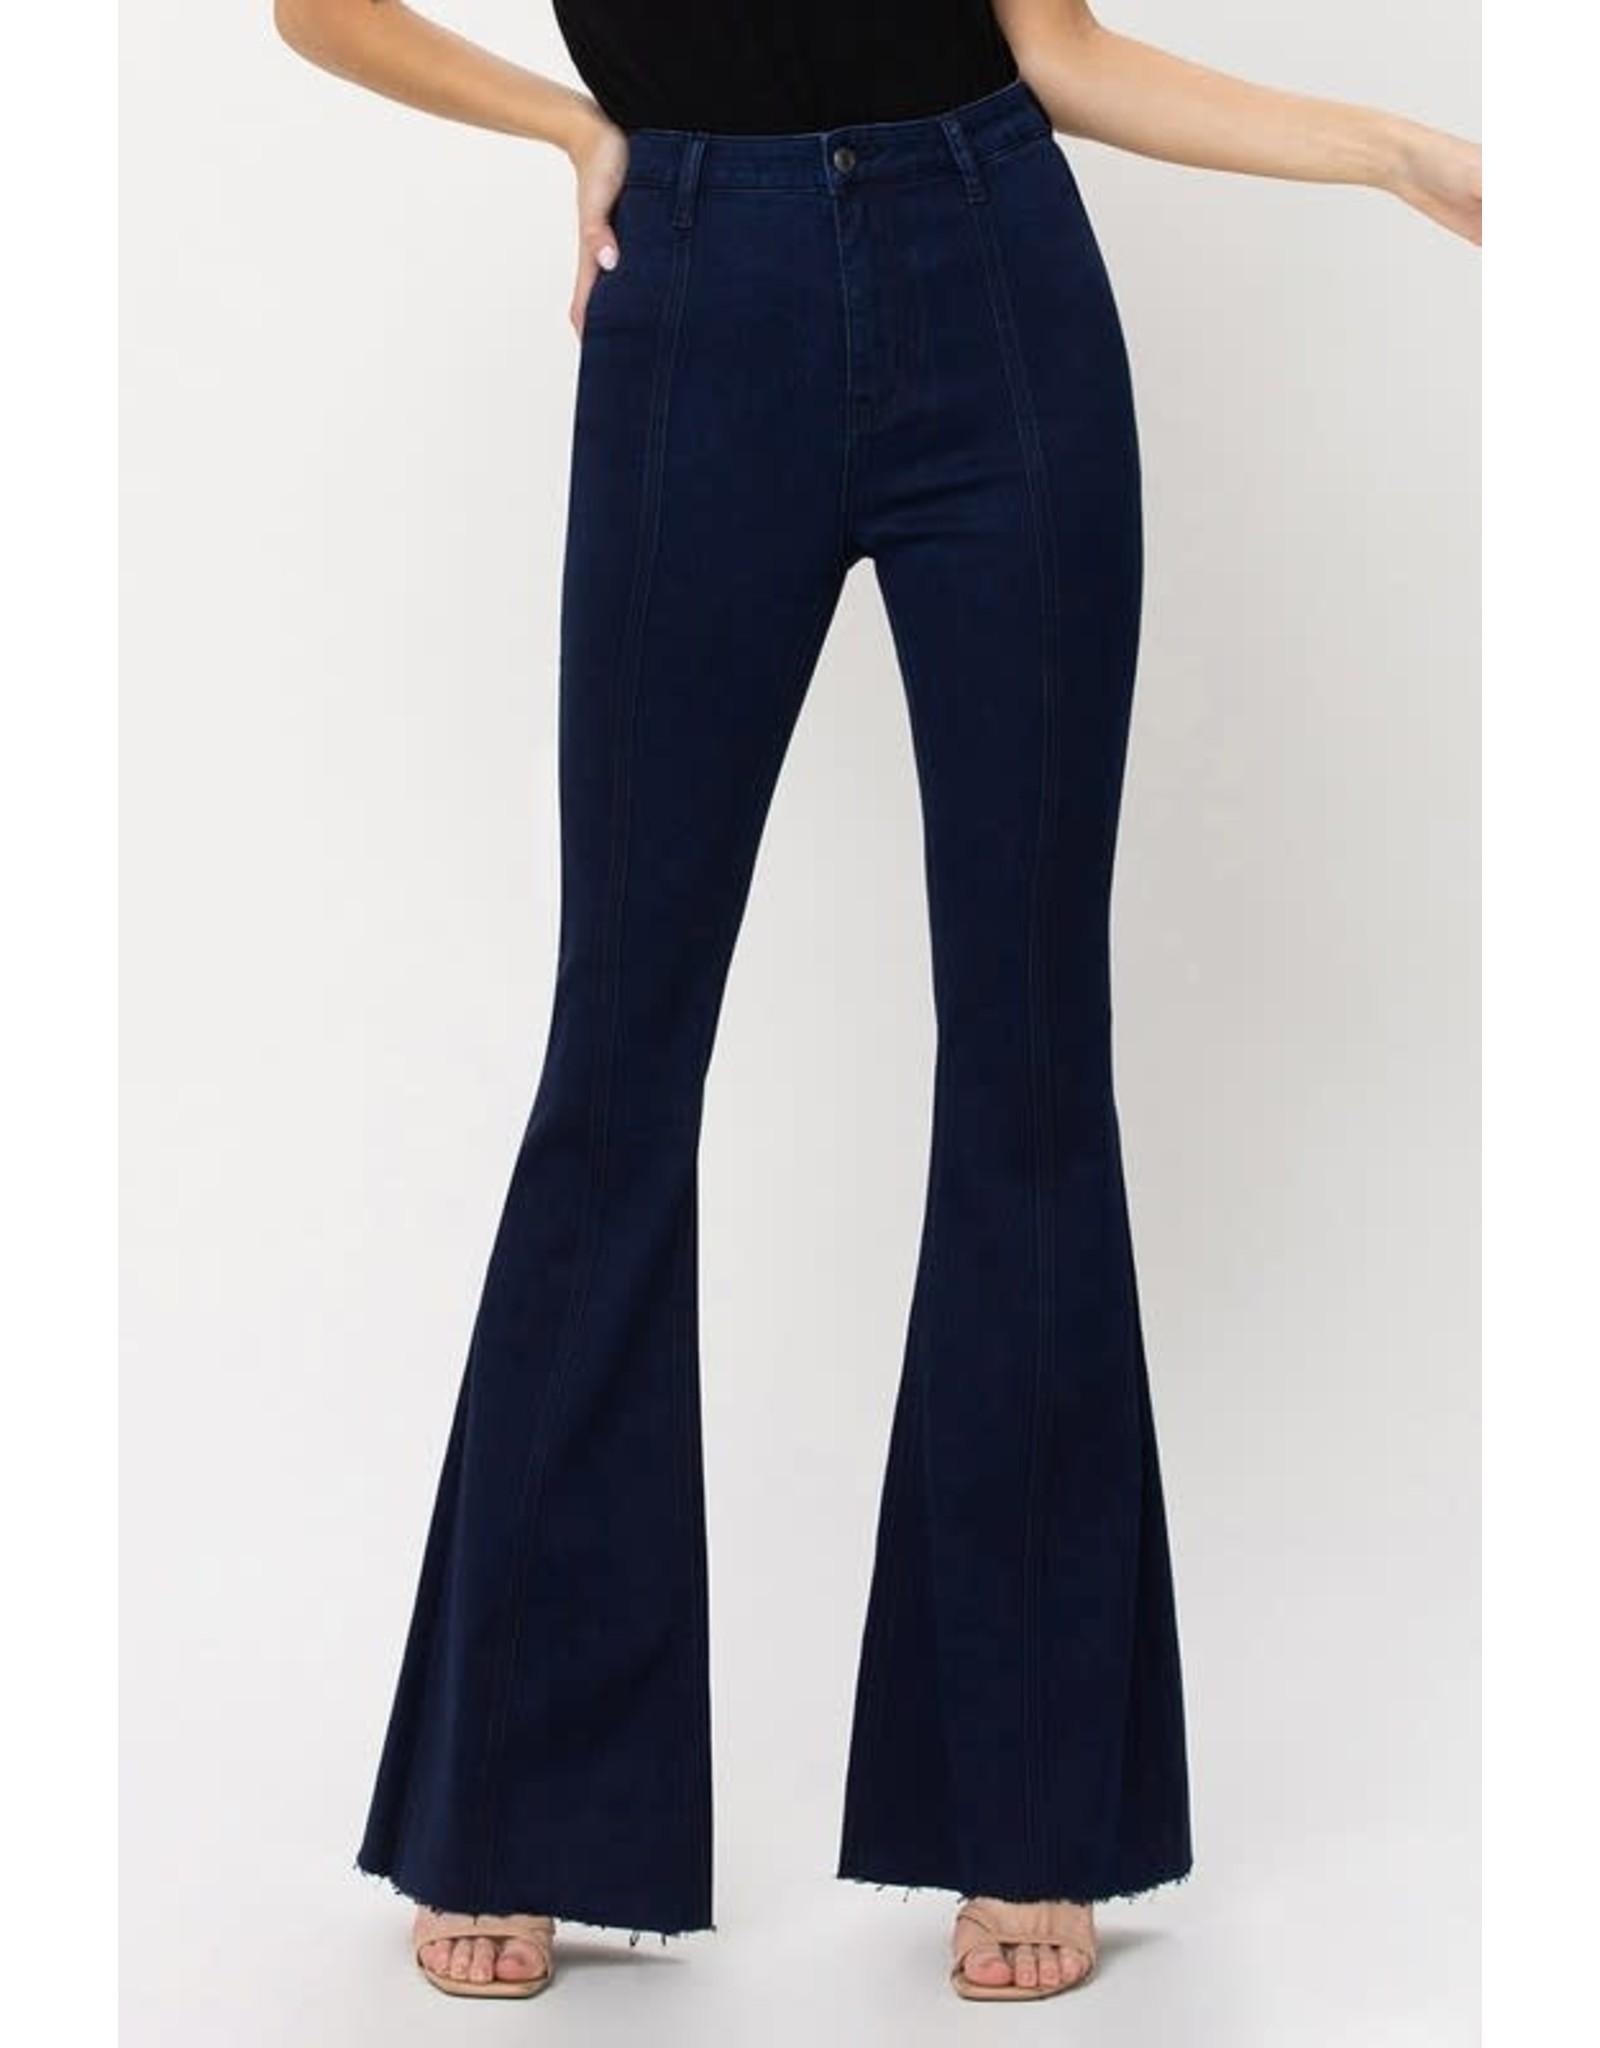 Vervet Fear Hallow HR Jeans